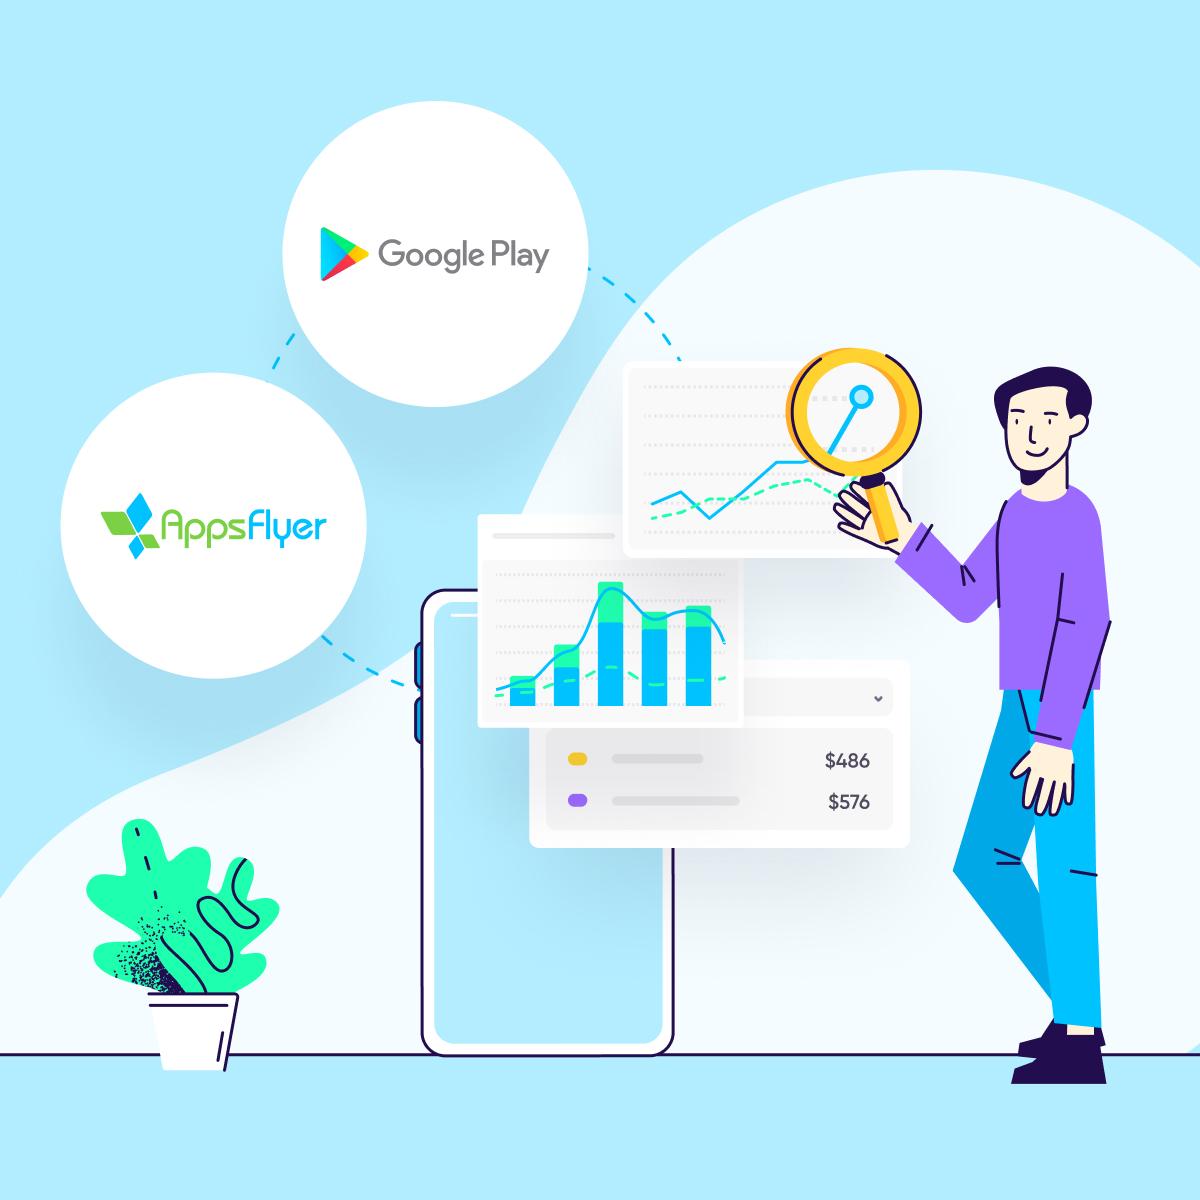 google play measurement accuracy